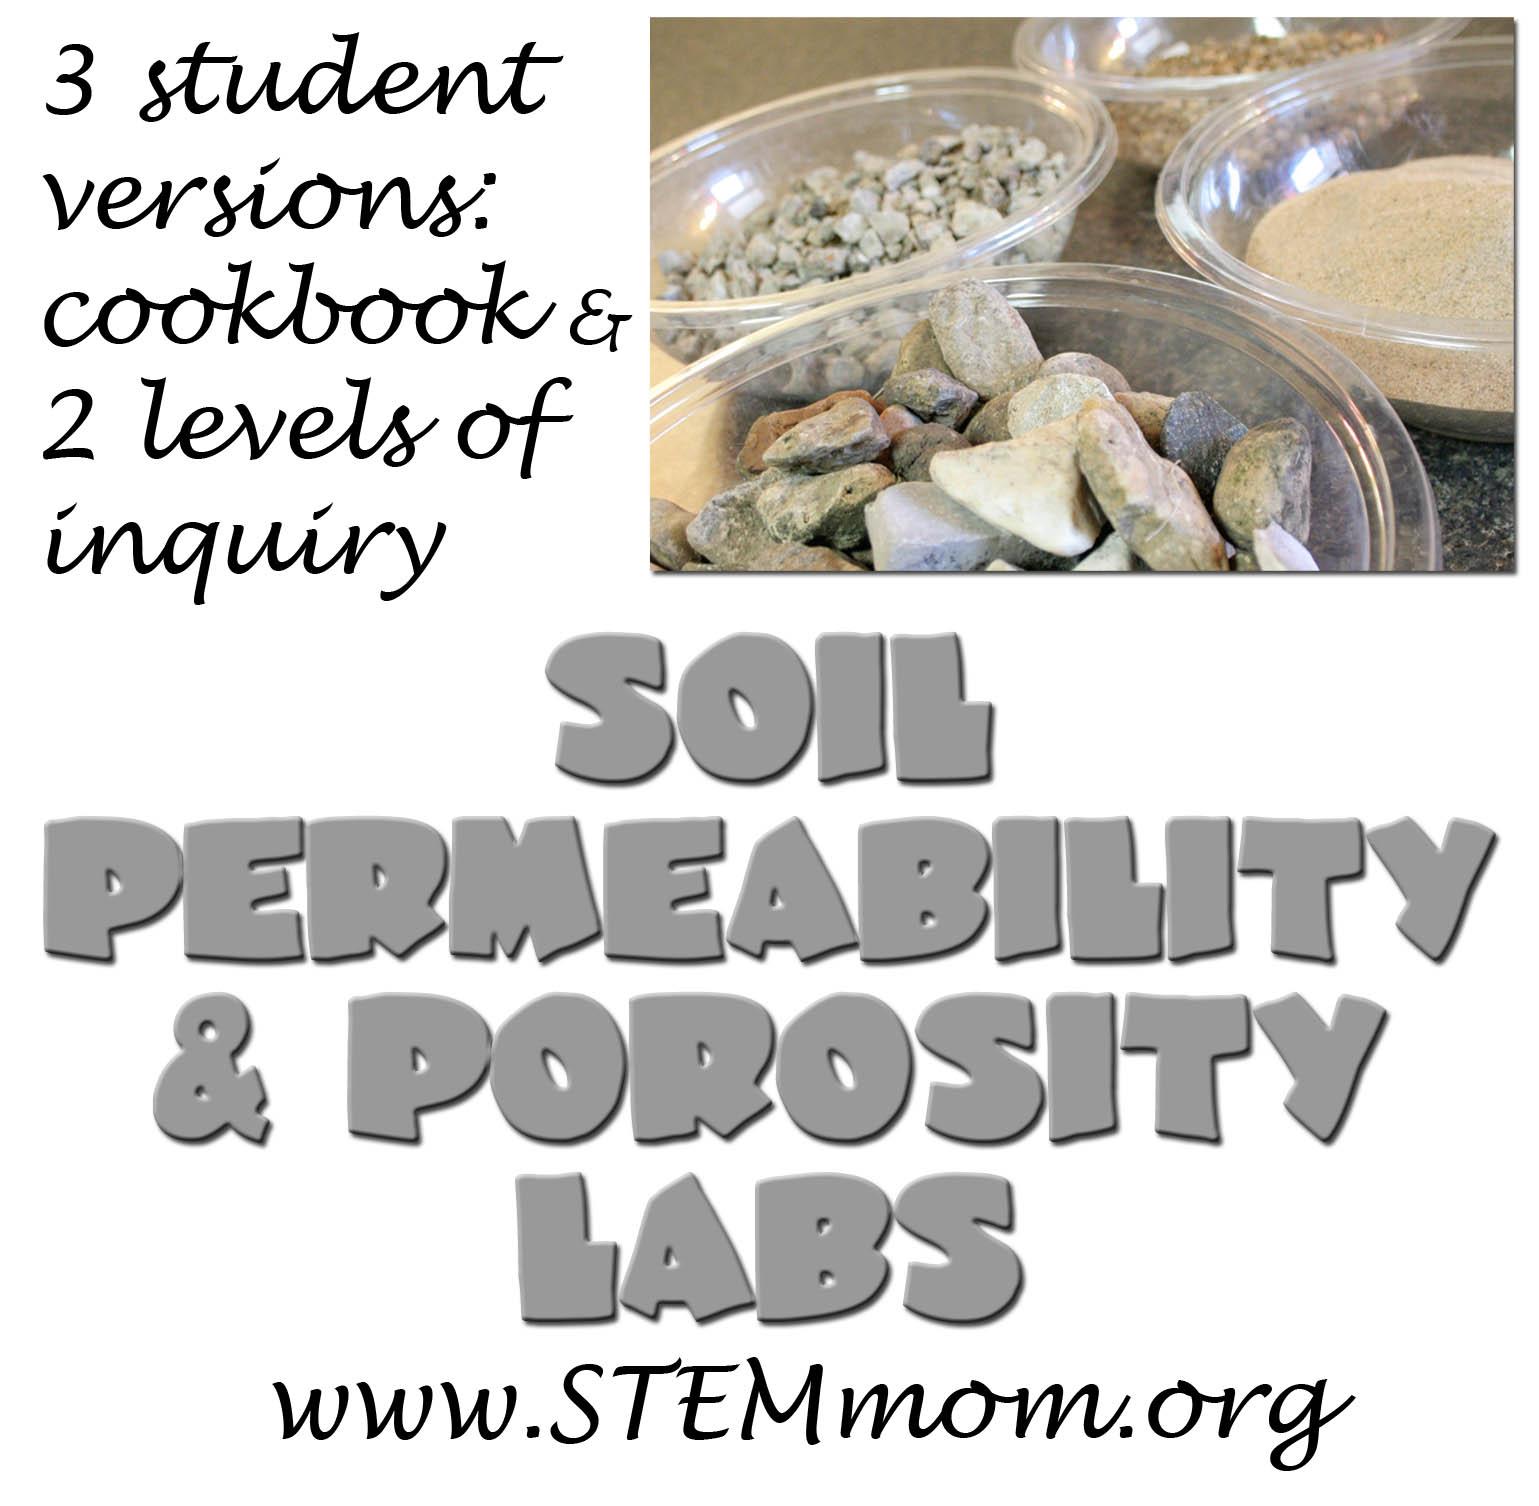 STEM Mom: Soil Permeability and Porosity Lab